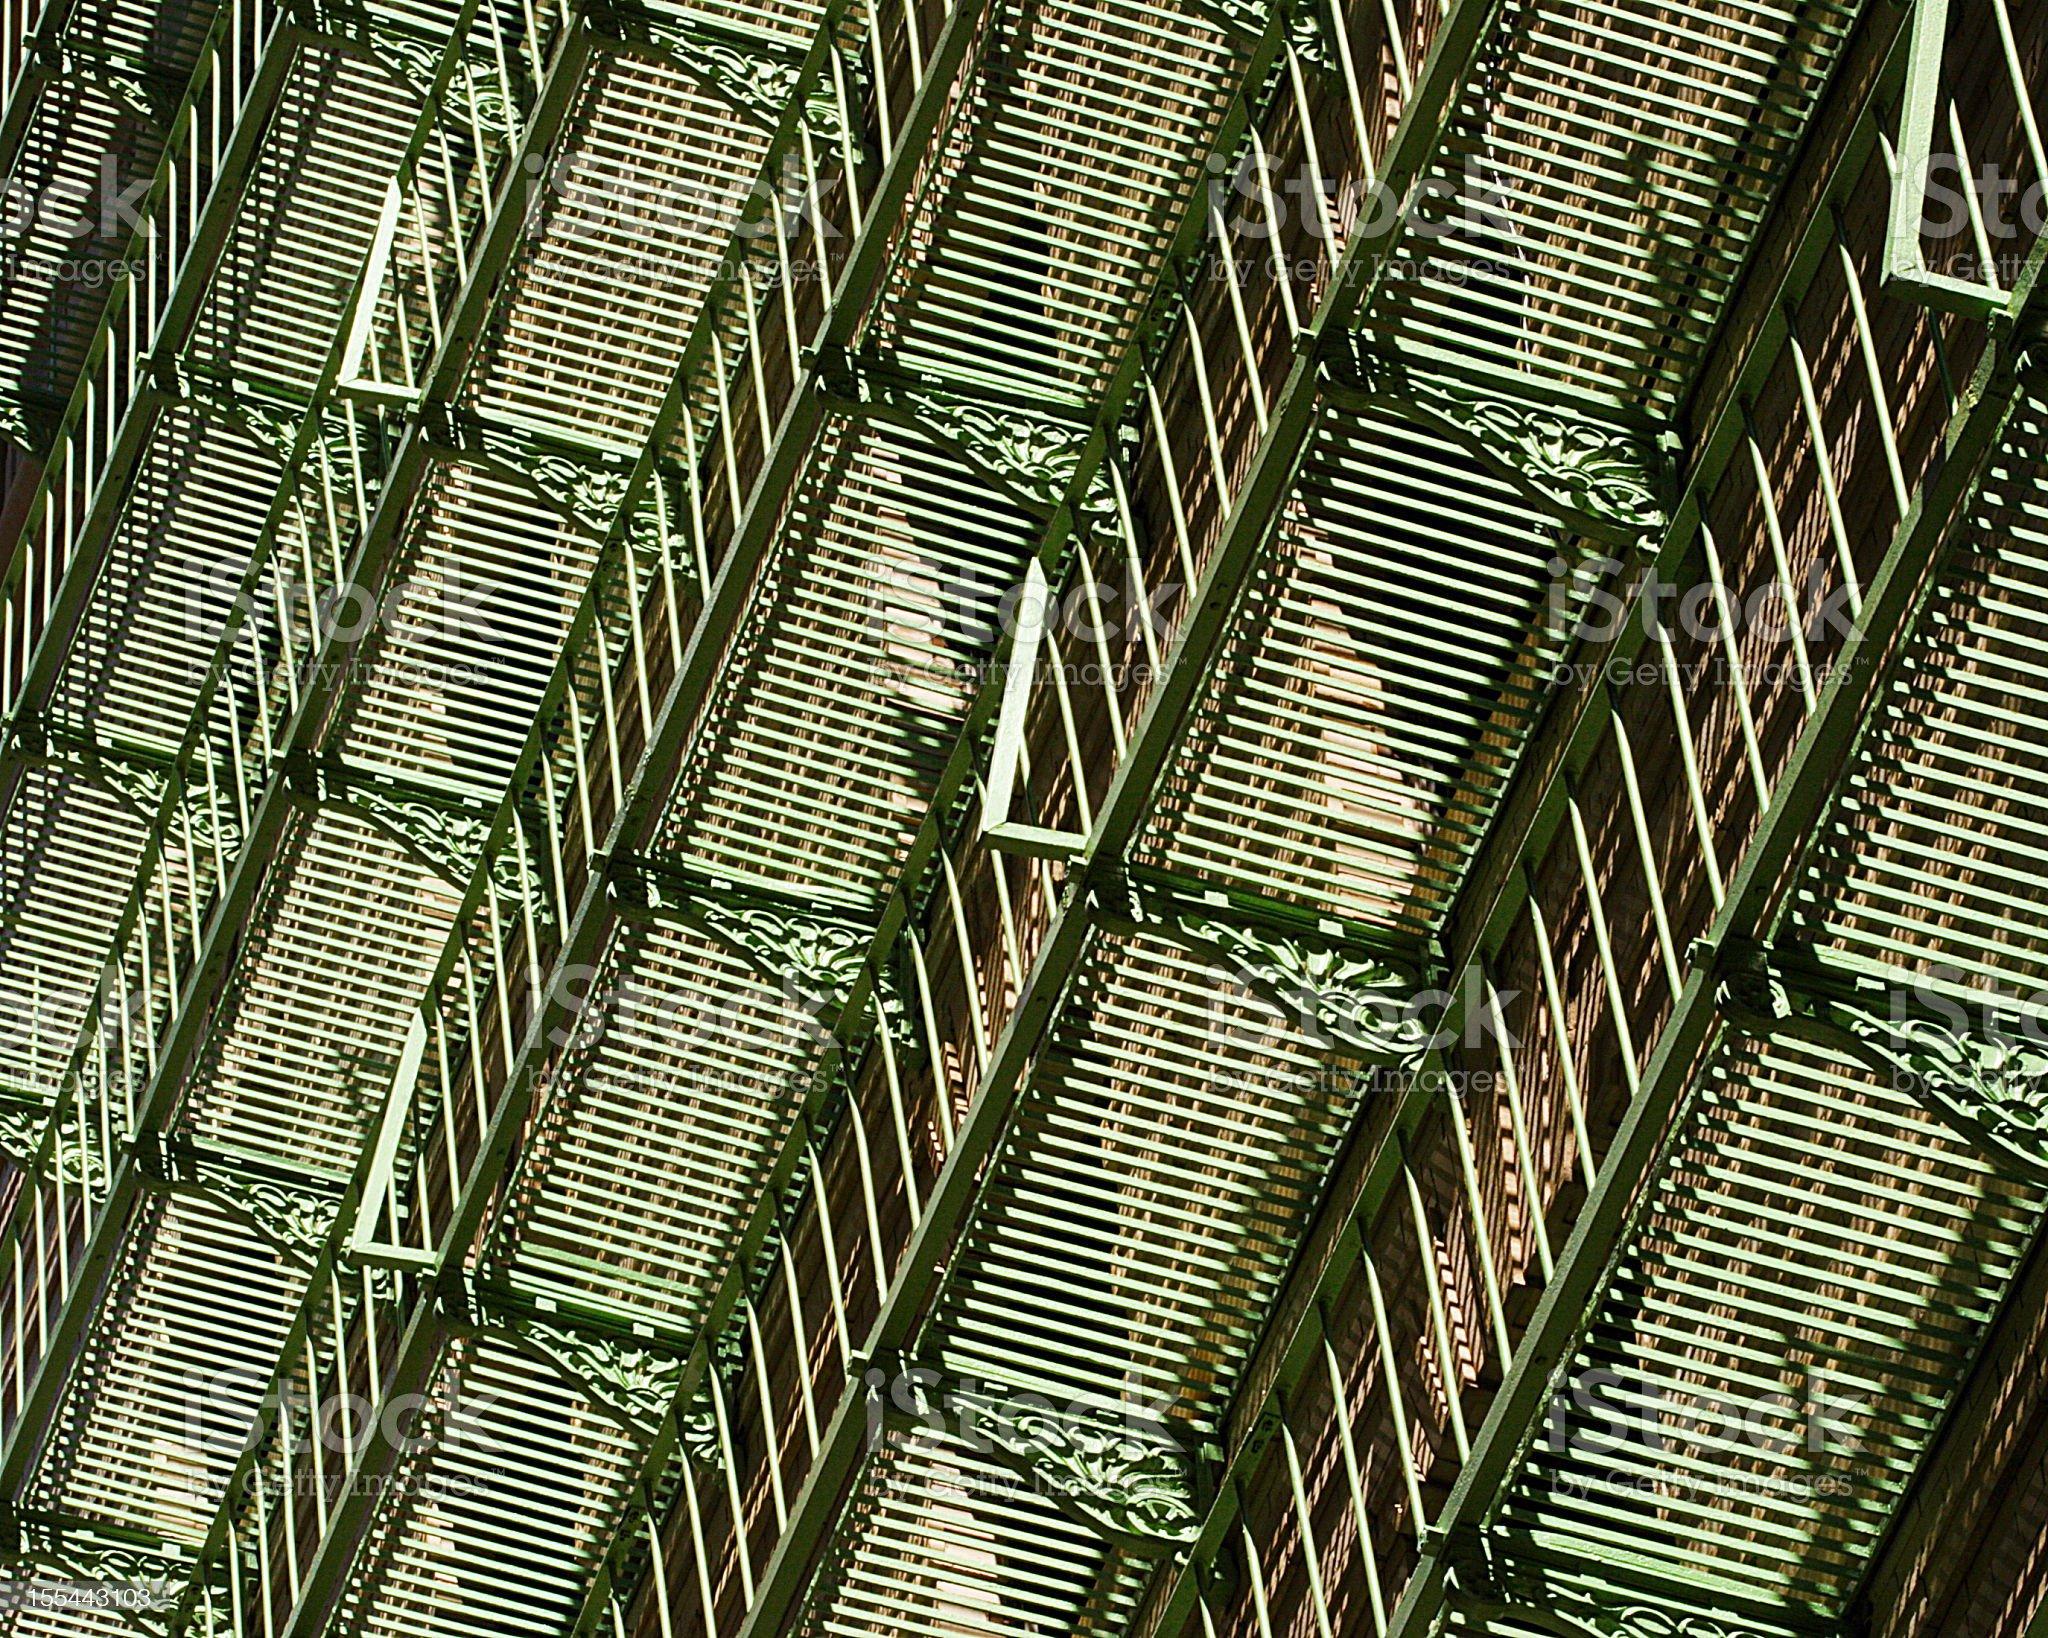 Wrought Iron Balcony Fire Escape Railing royalty-free stock photo